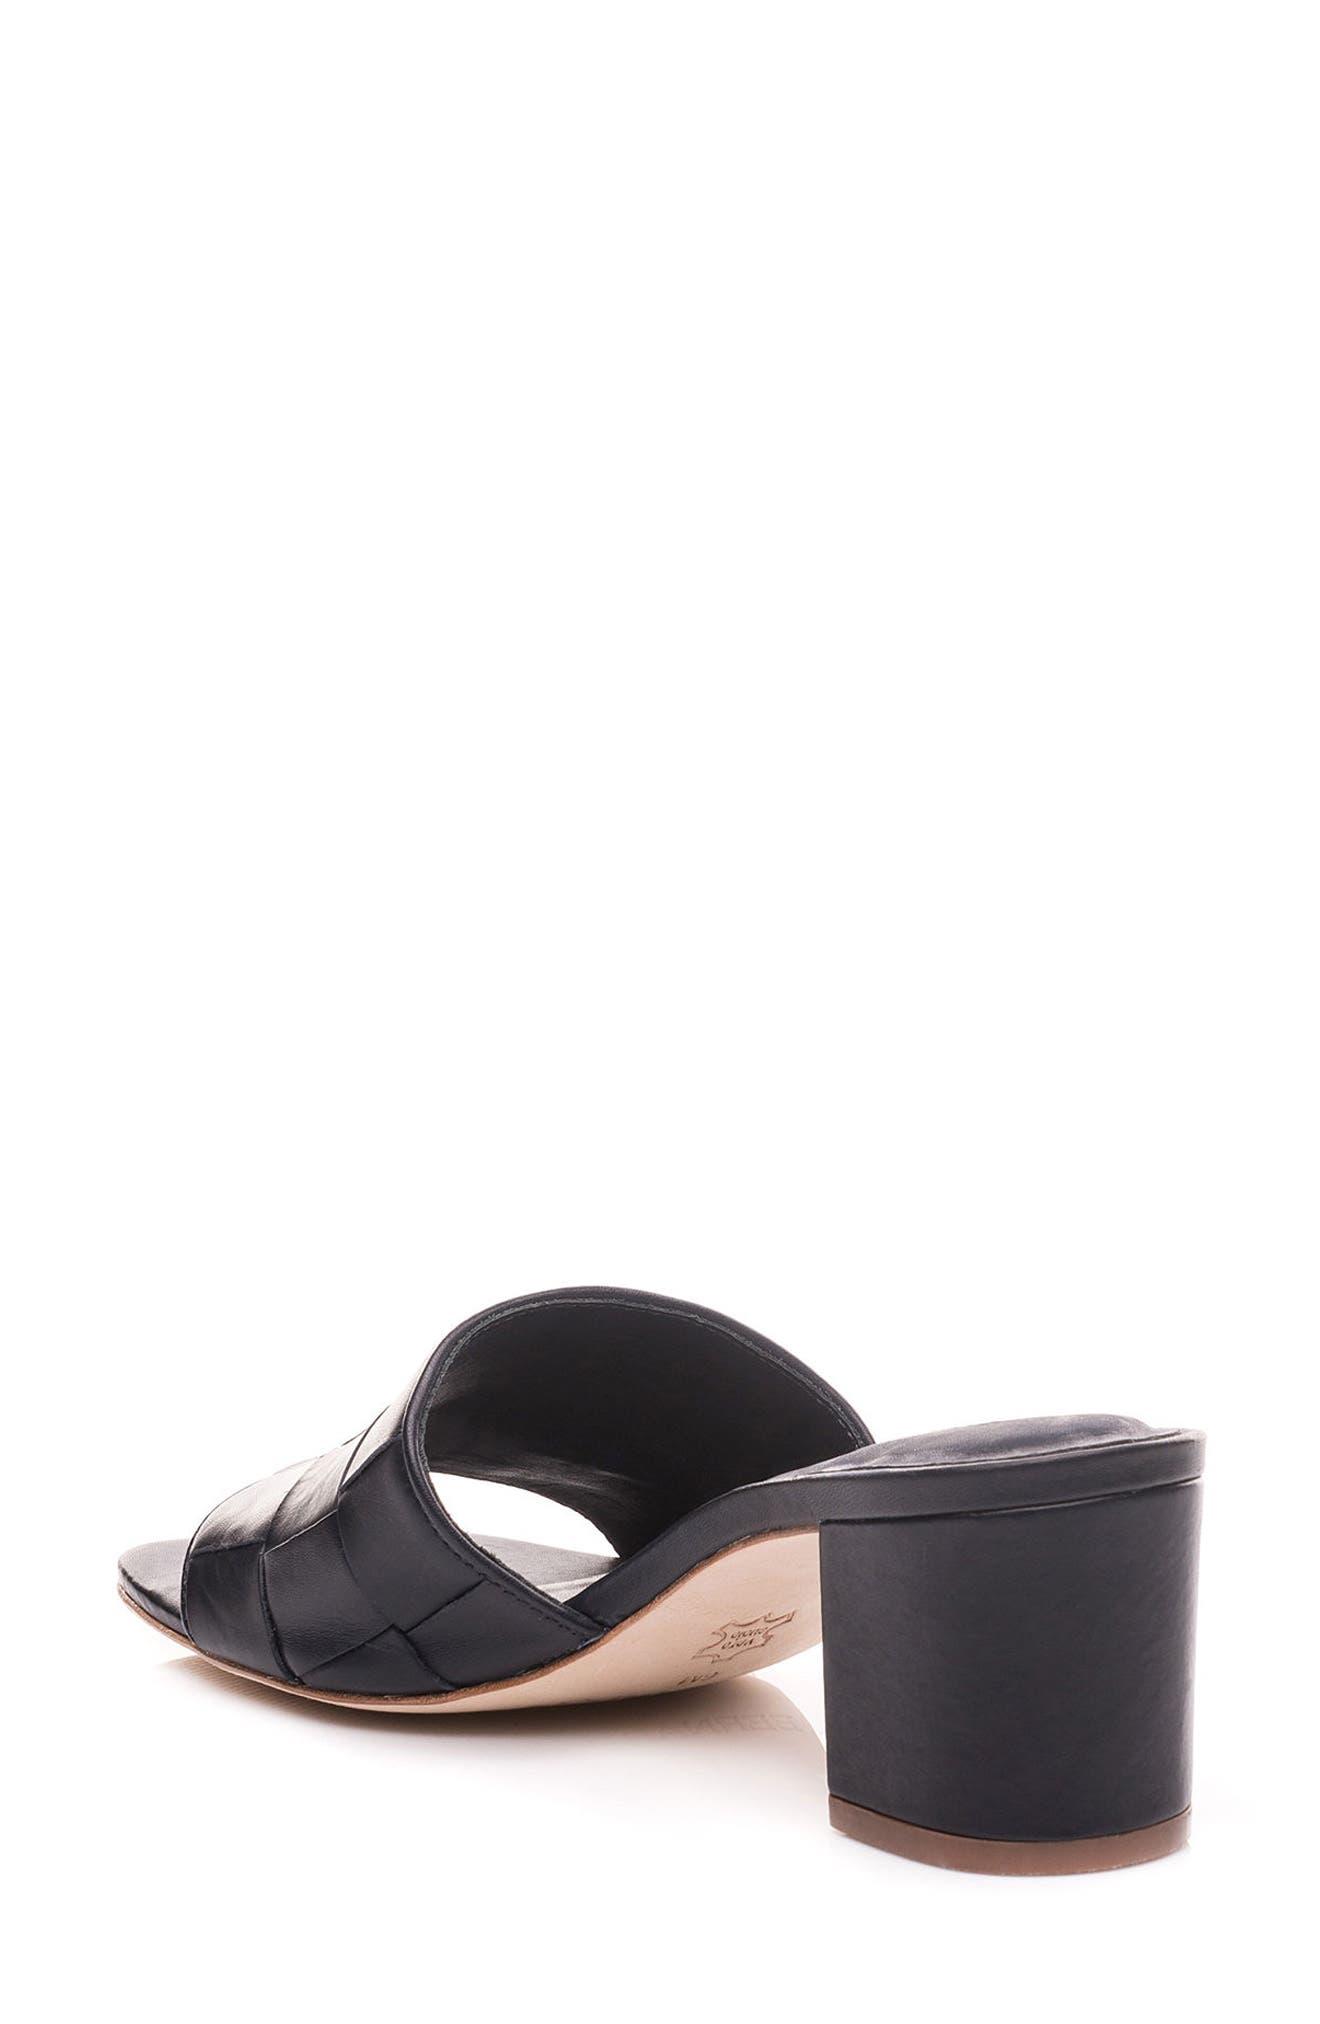 Bernardo Bridget Block Heel Sandal,                             Alternate thumbnail 8, color,